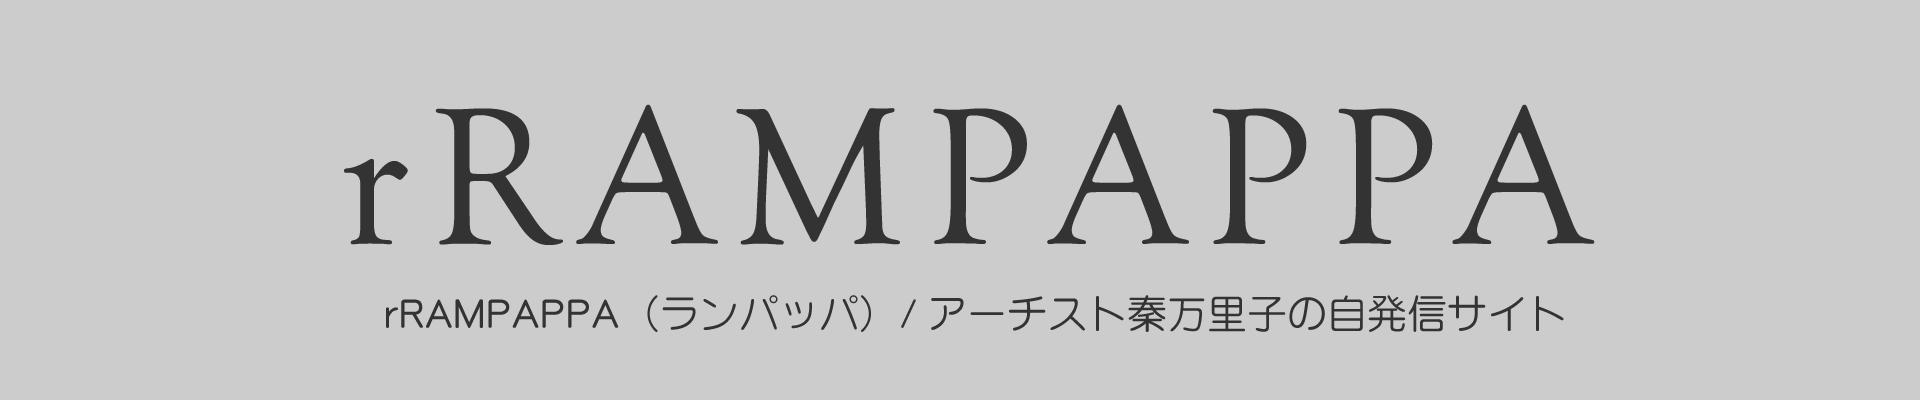 rRAMPAPPA(ランパッパ) / アーチスト秦万里子の自発信サイト